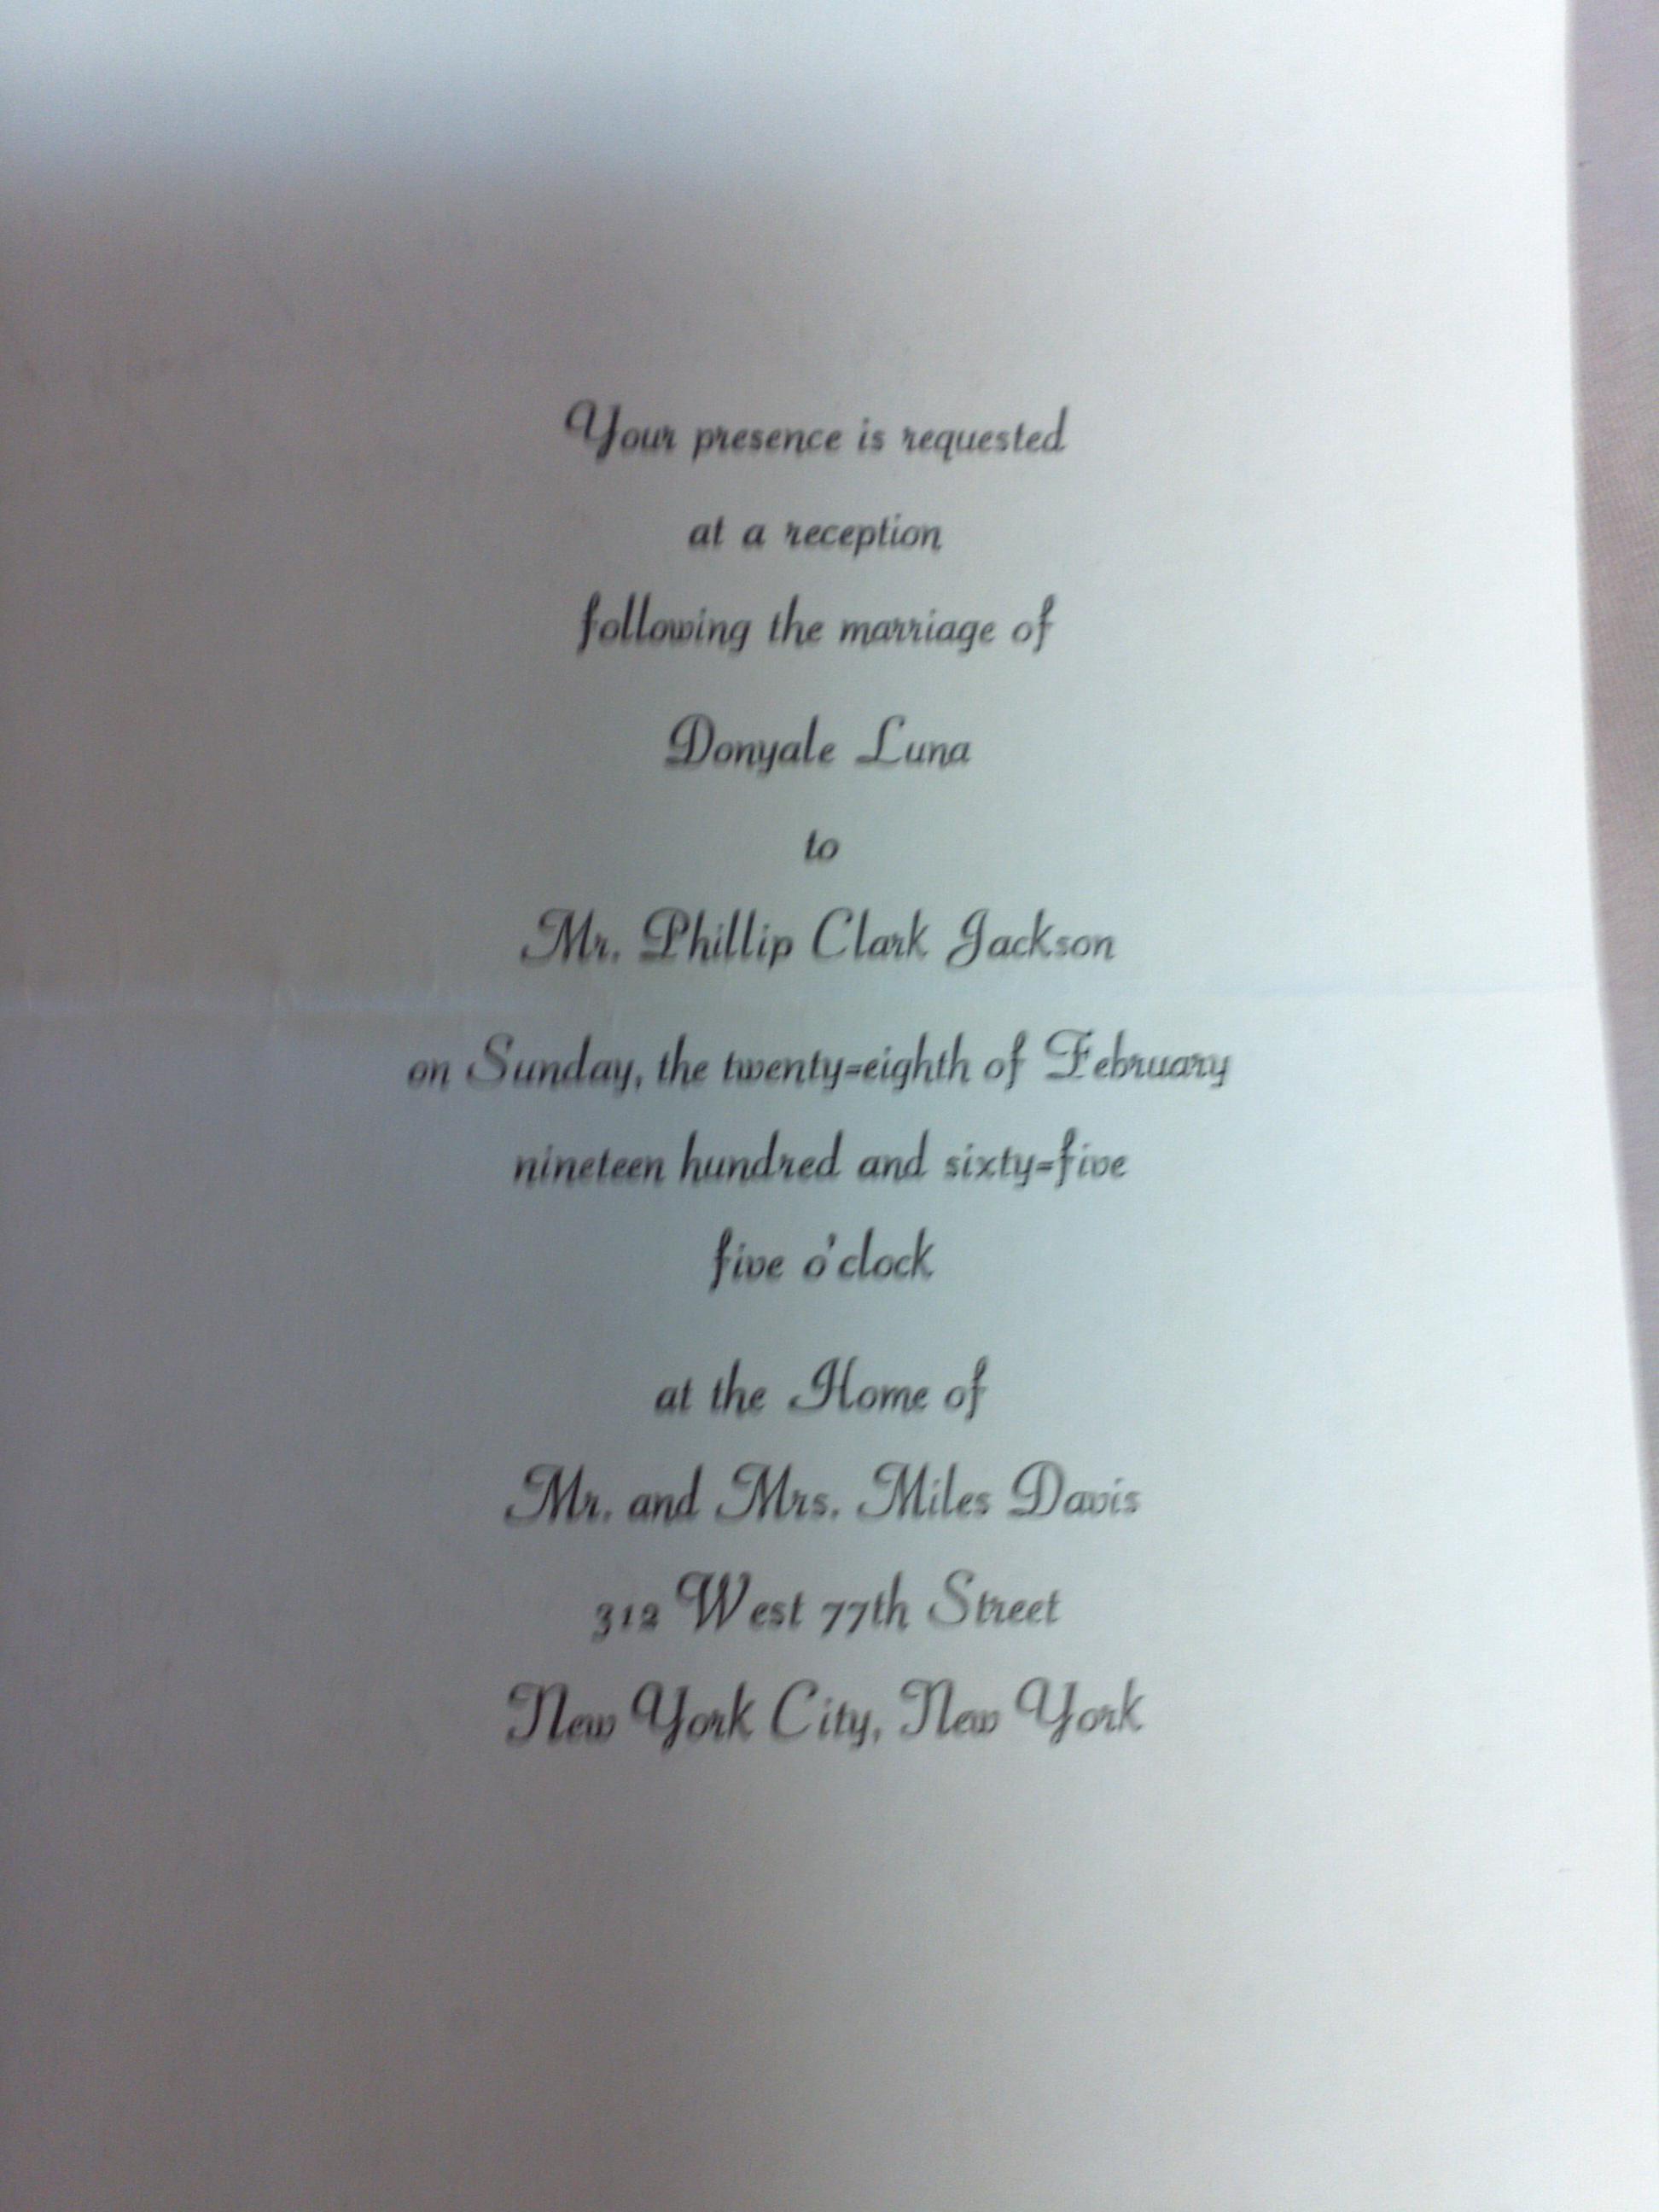 Post Wedding Reception Invitations Wording Invitation Wording – Invitation for Funeral